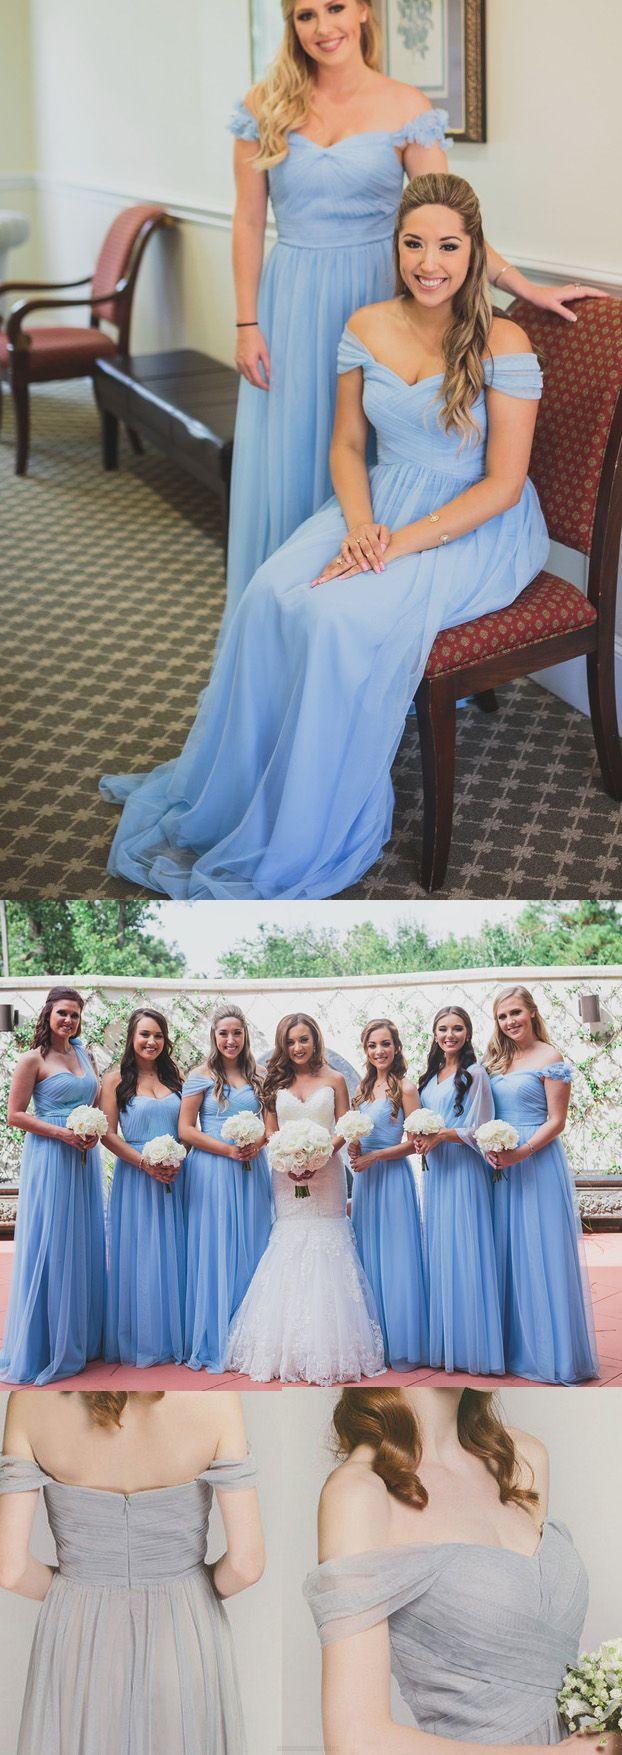 The 25 best light blue bridesmaid dresses ideas on pinterest long a lineprincess bridesmaid dresses light blue sleeveless with ruffles floor length bridesmaid dresses wf02g47 778 ombrellifo Gallery